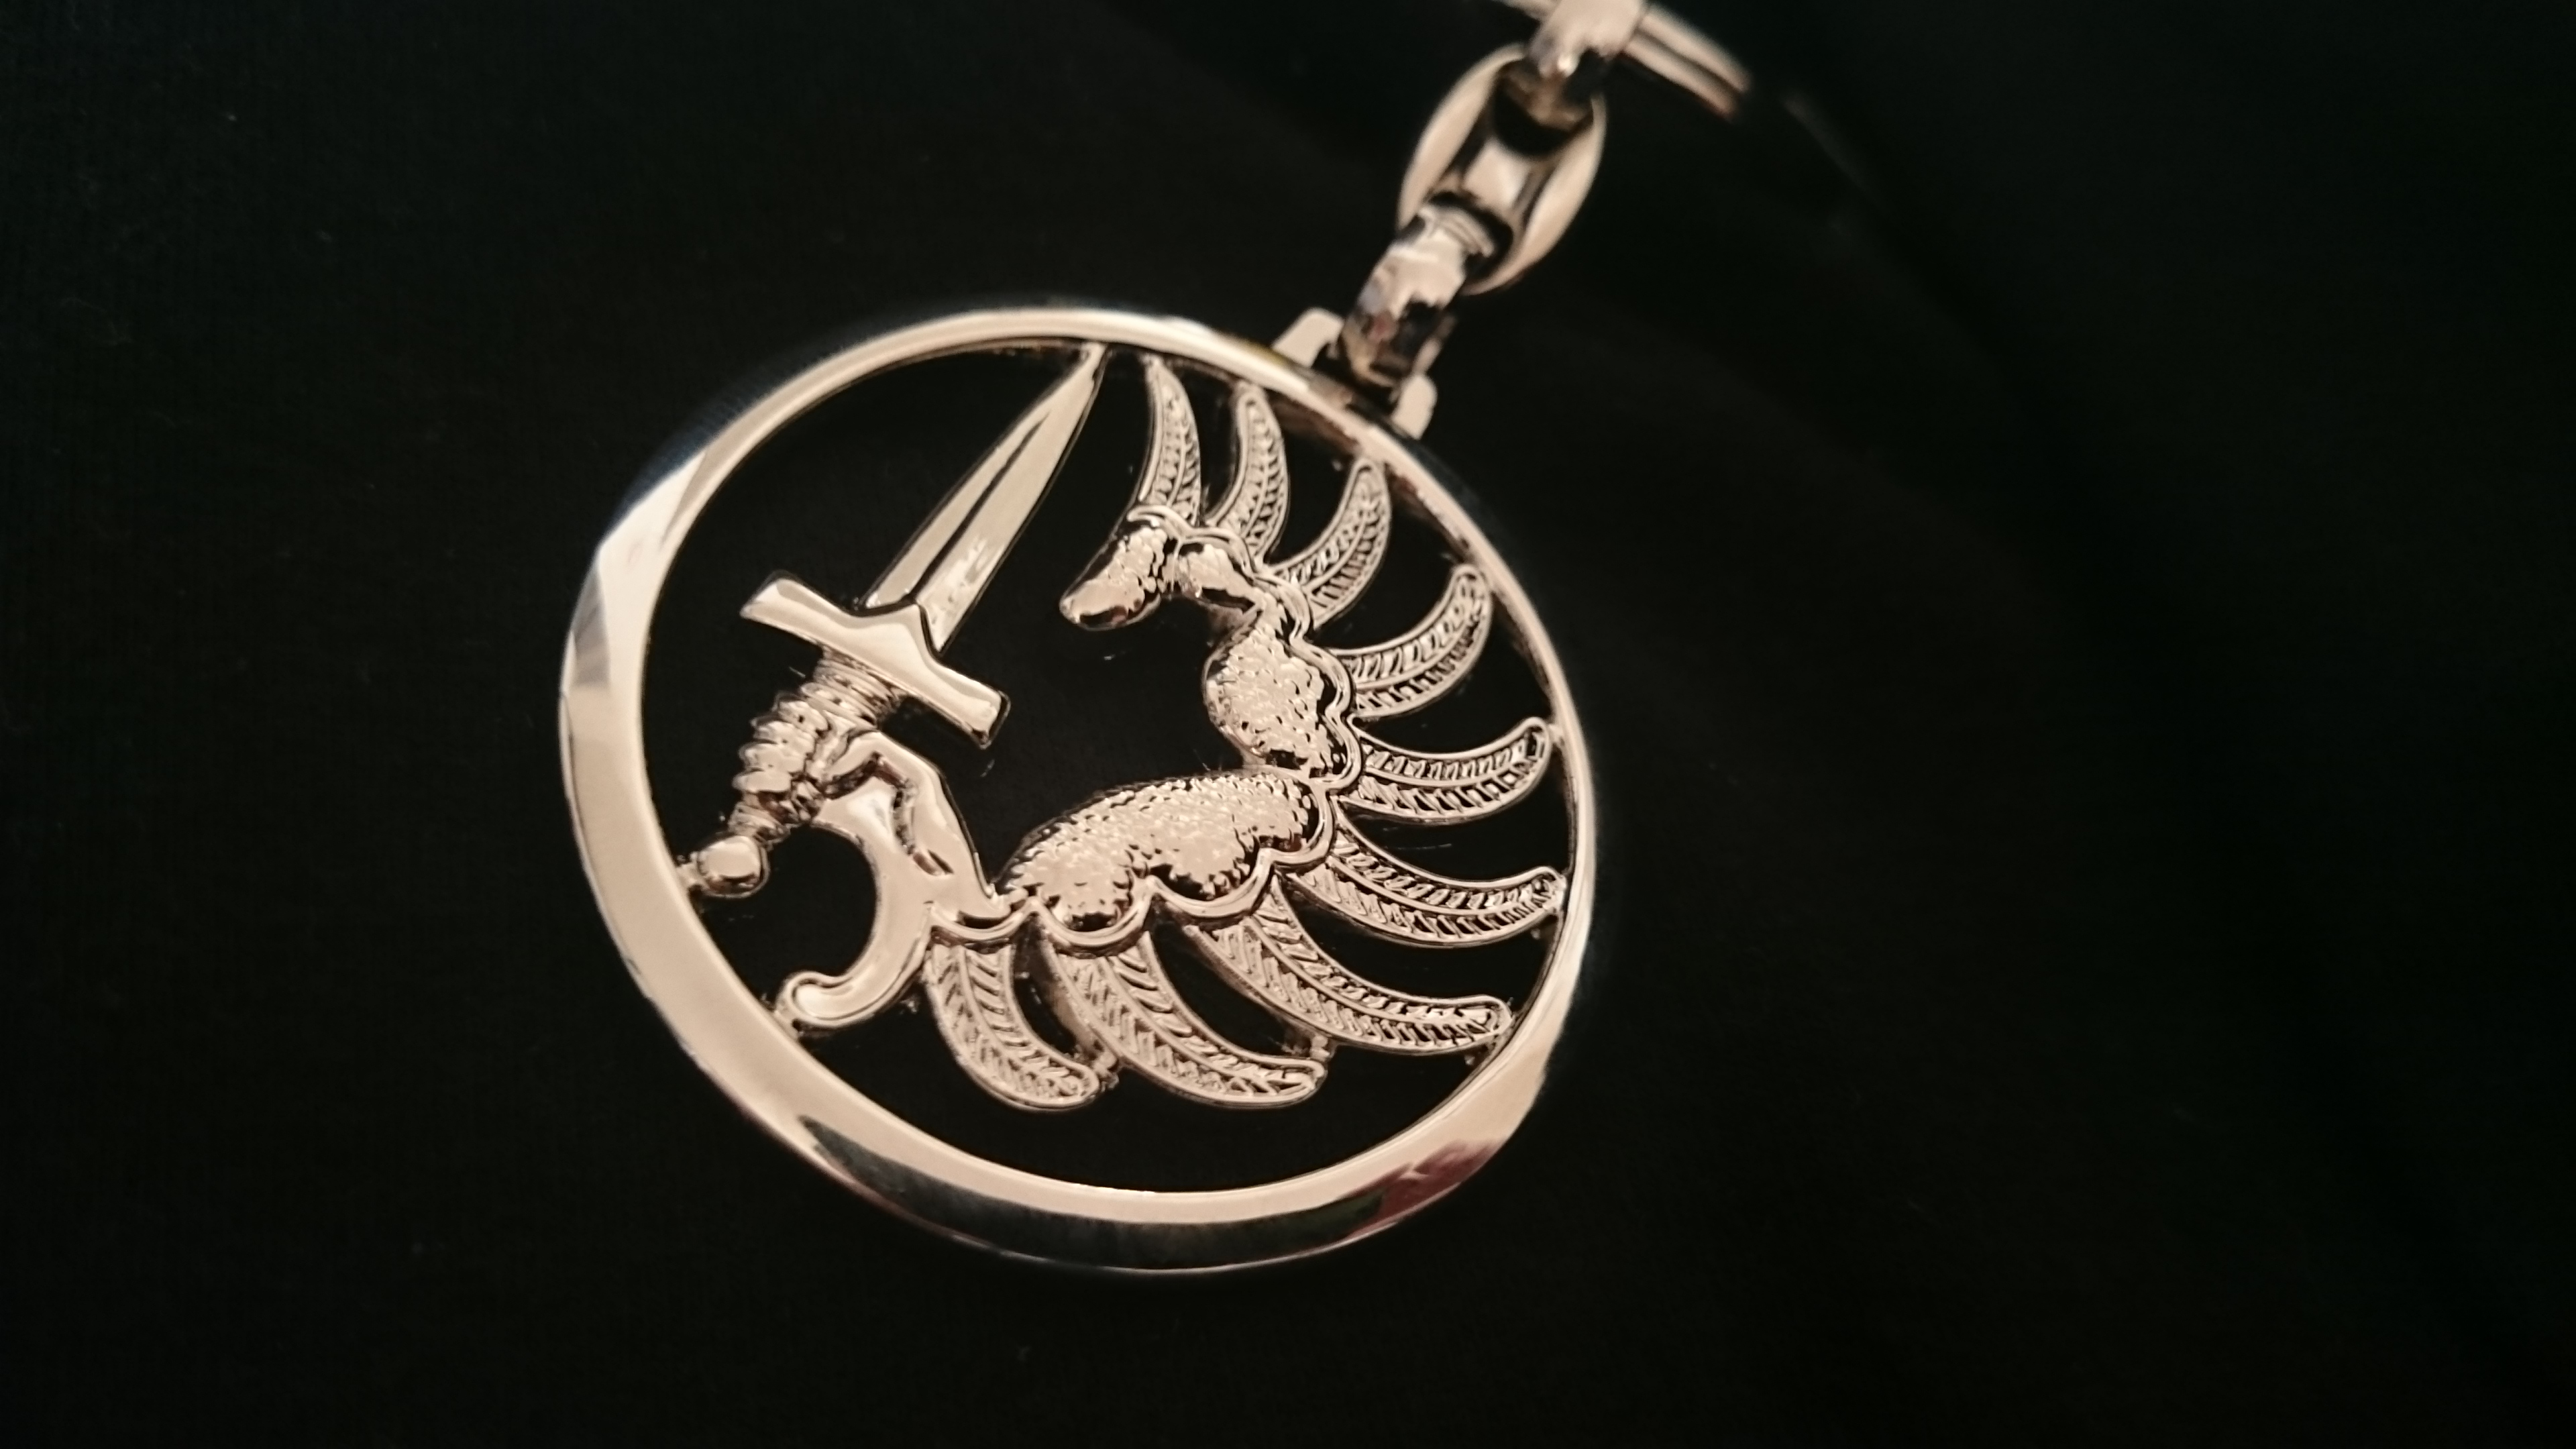 Keychain by Crusadier